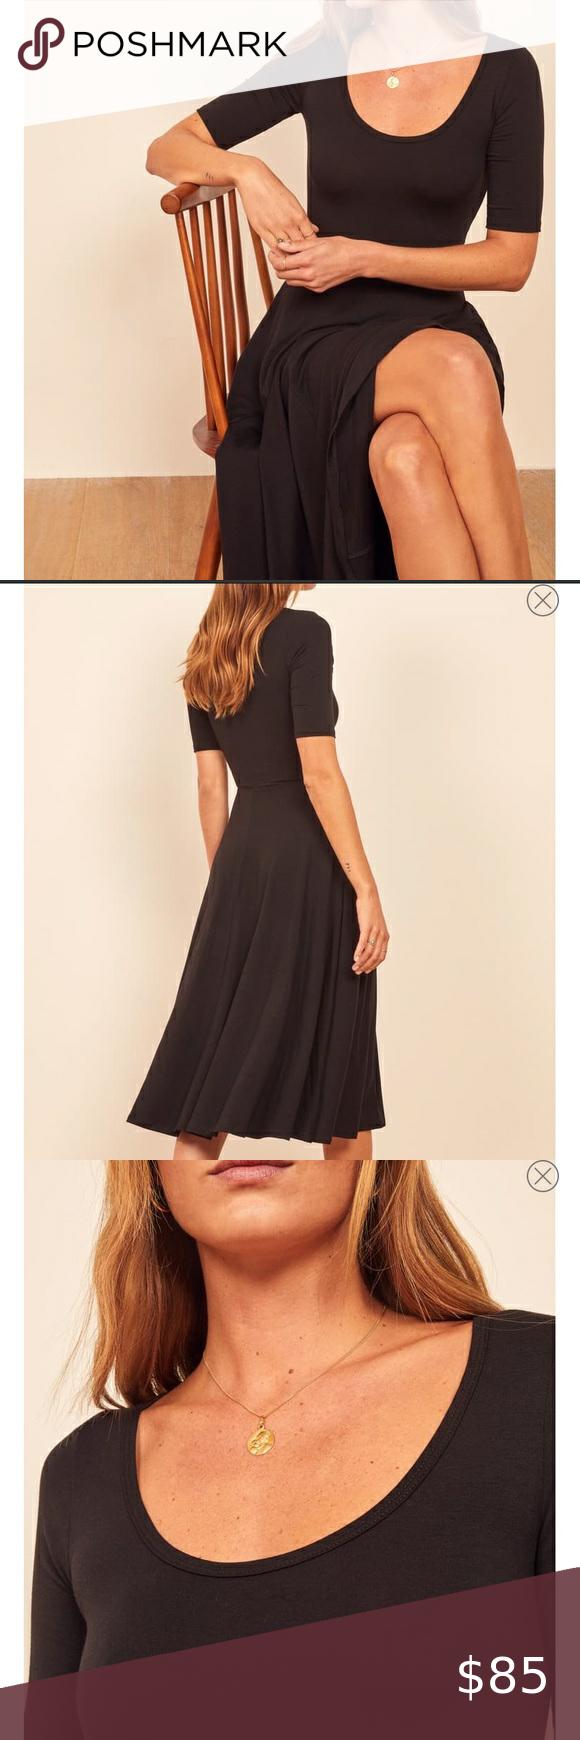 Reformation Lilian Black Dress Sz Xl Fit Flare In 2020 Black Dress Fit Flare Dress Dresses [ 1740 x 580 Pixel ]